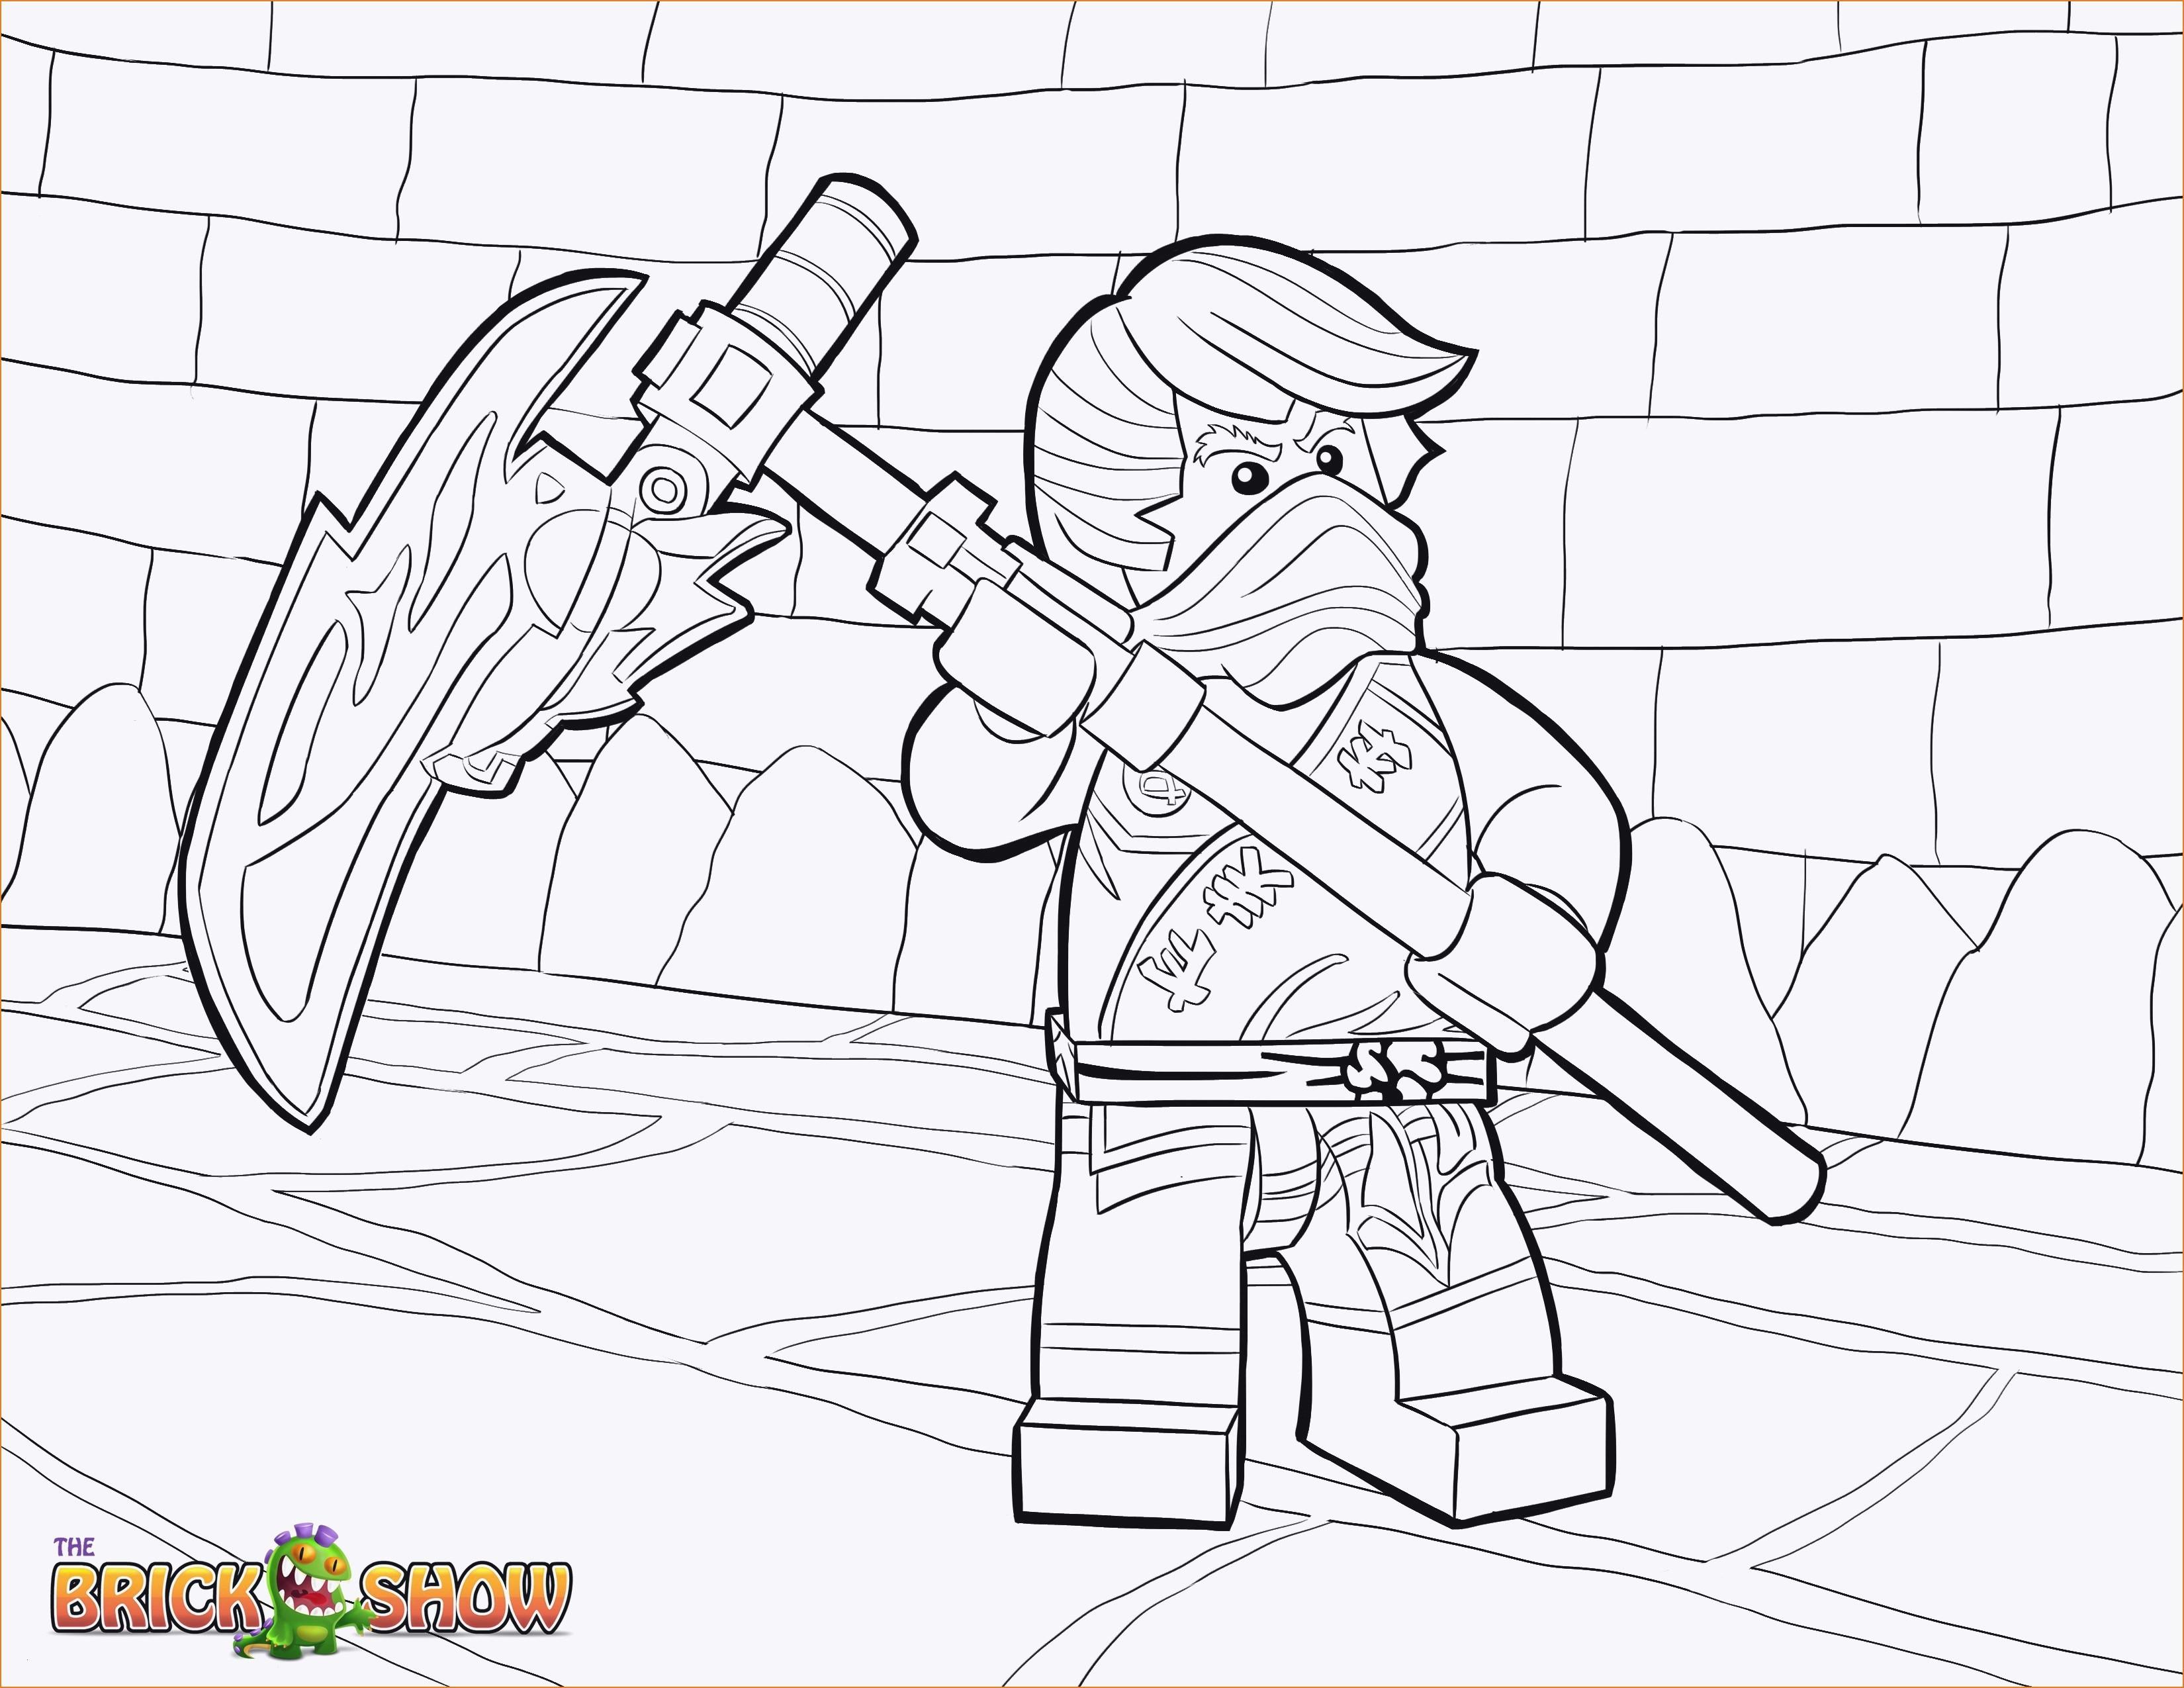 Ninjago Jay Ausmalbilder Inspirierend Ausmalbilder Lego Ninjago Kai Inspirierend Ninjago Jay Coloring Galerie